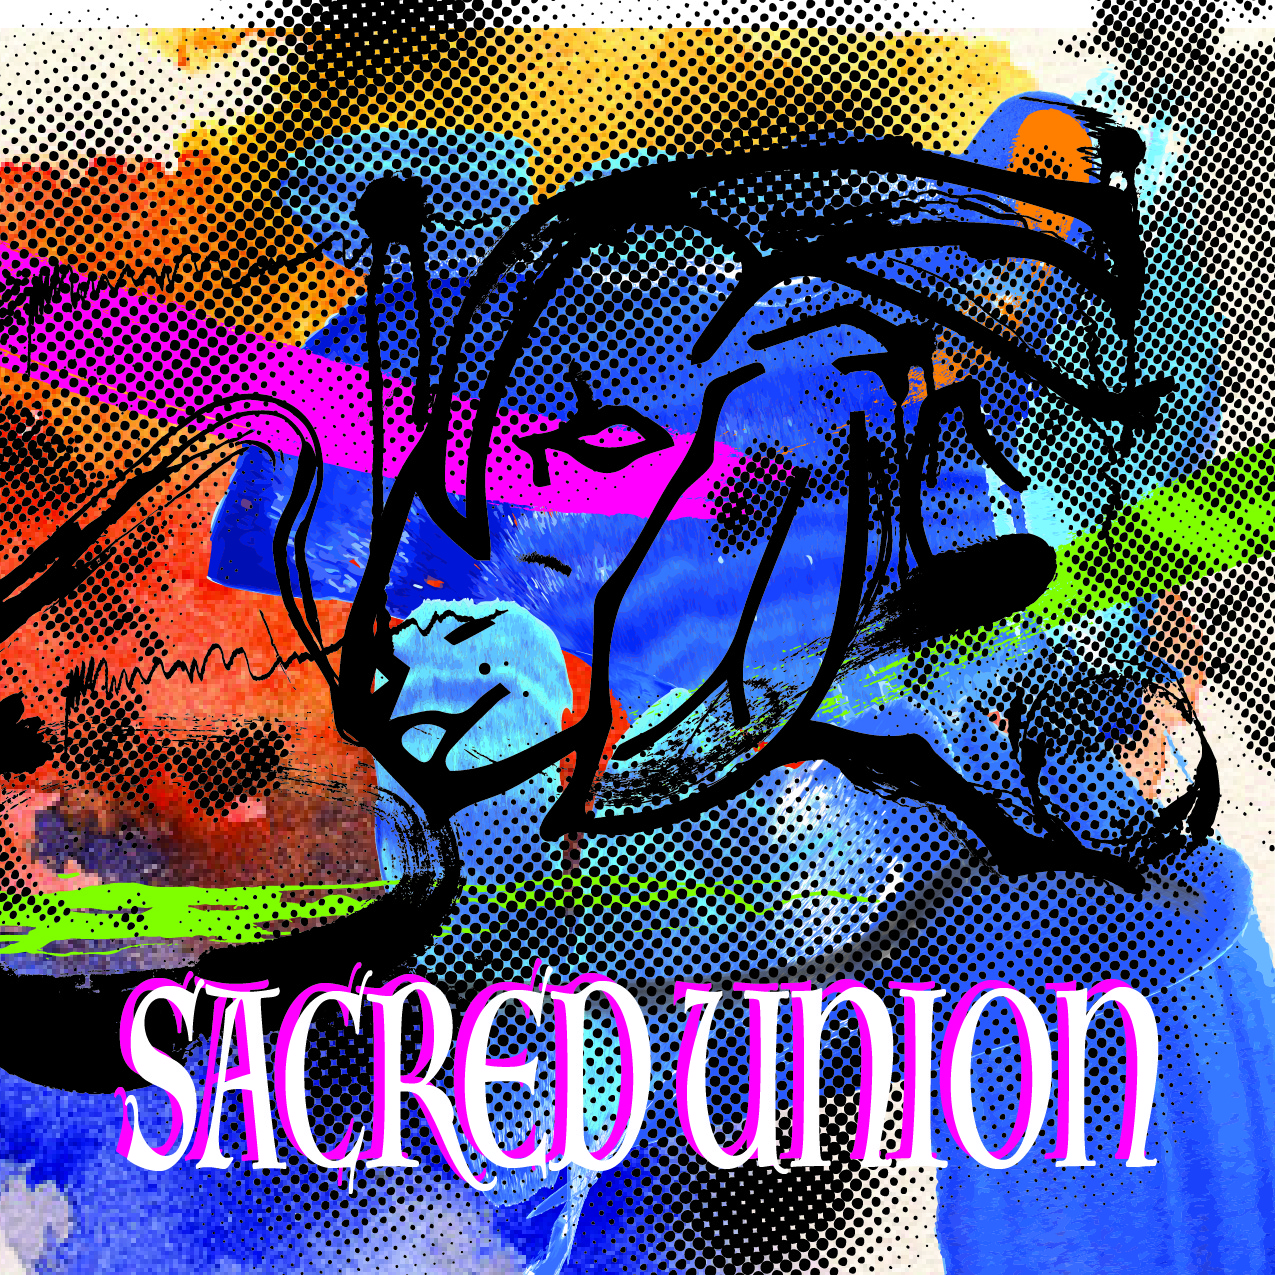 WebTab_SacredUnion_TheShopBeerCo_TempeAZ.jpg